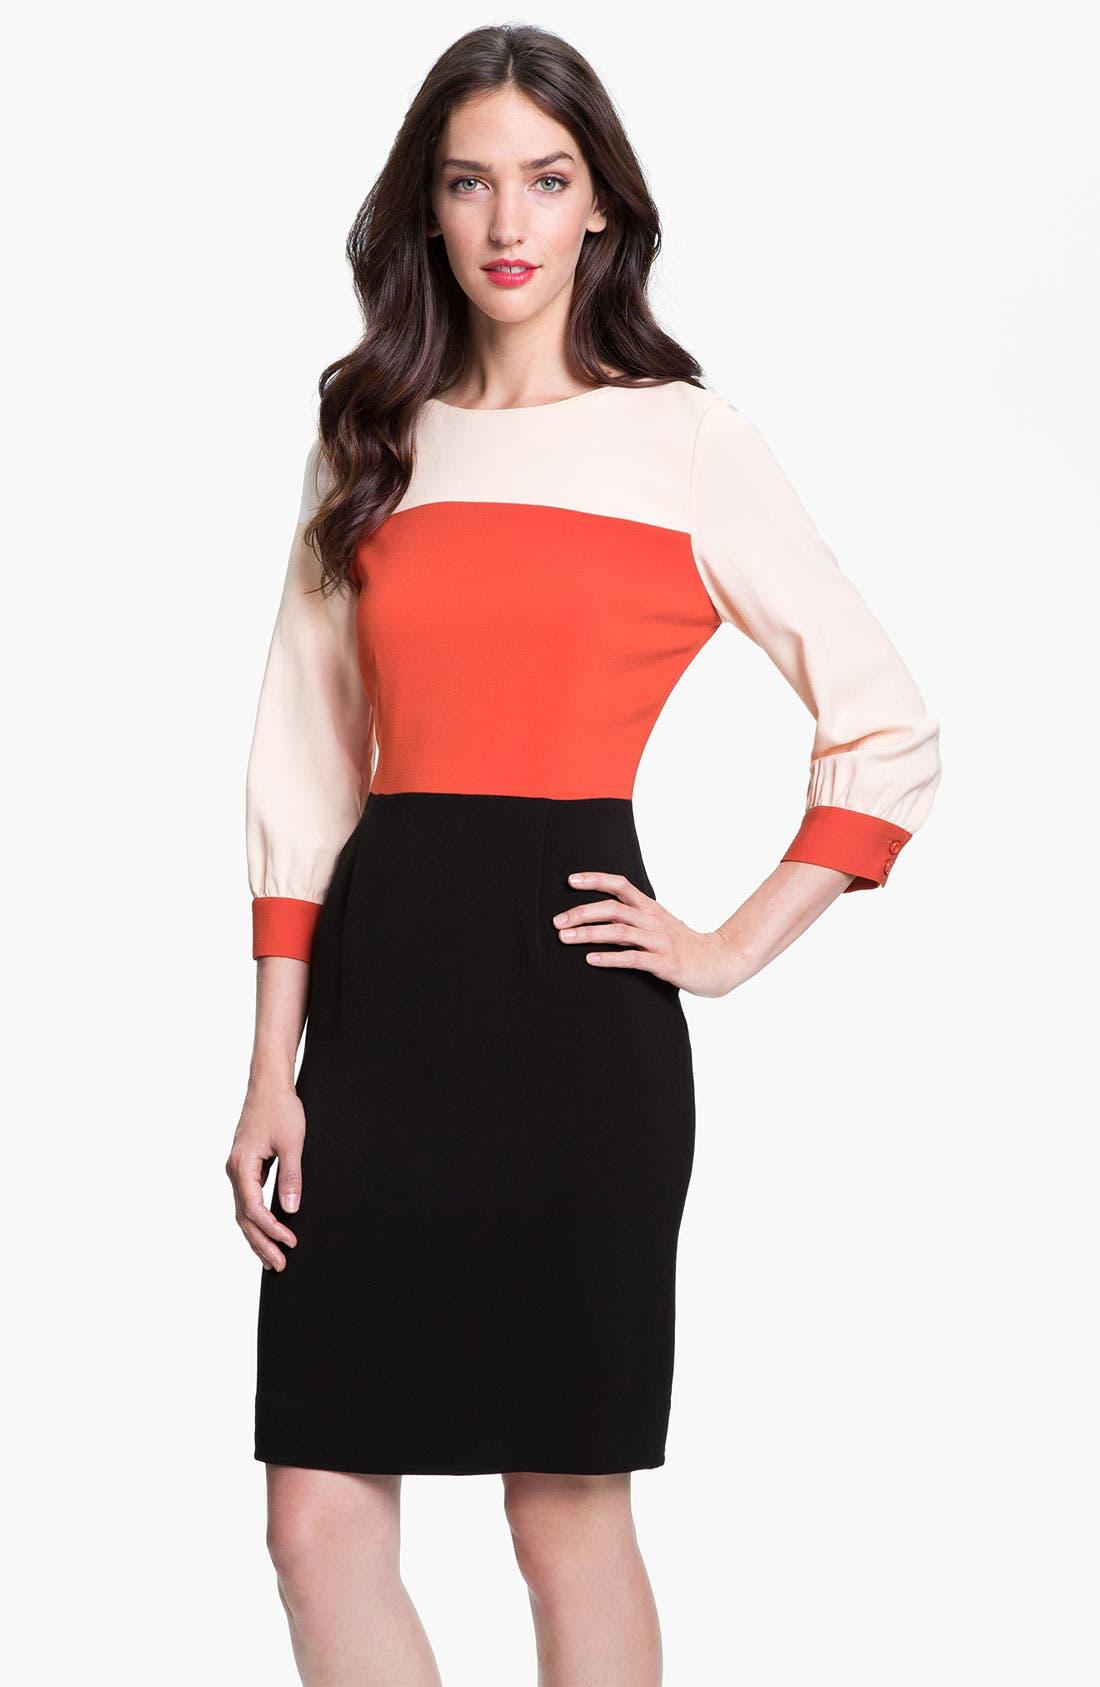 Alternate Image 1 Selected - kate spade new york 'parker' colorblock sheath dress